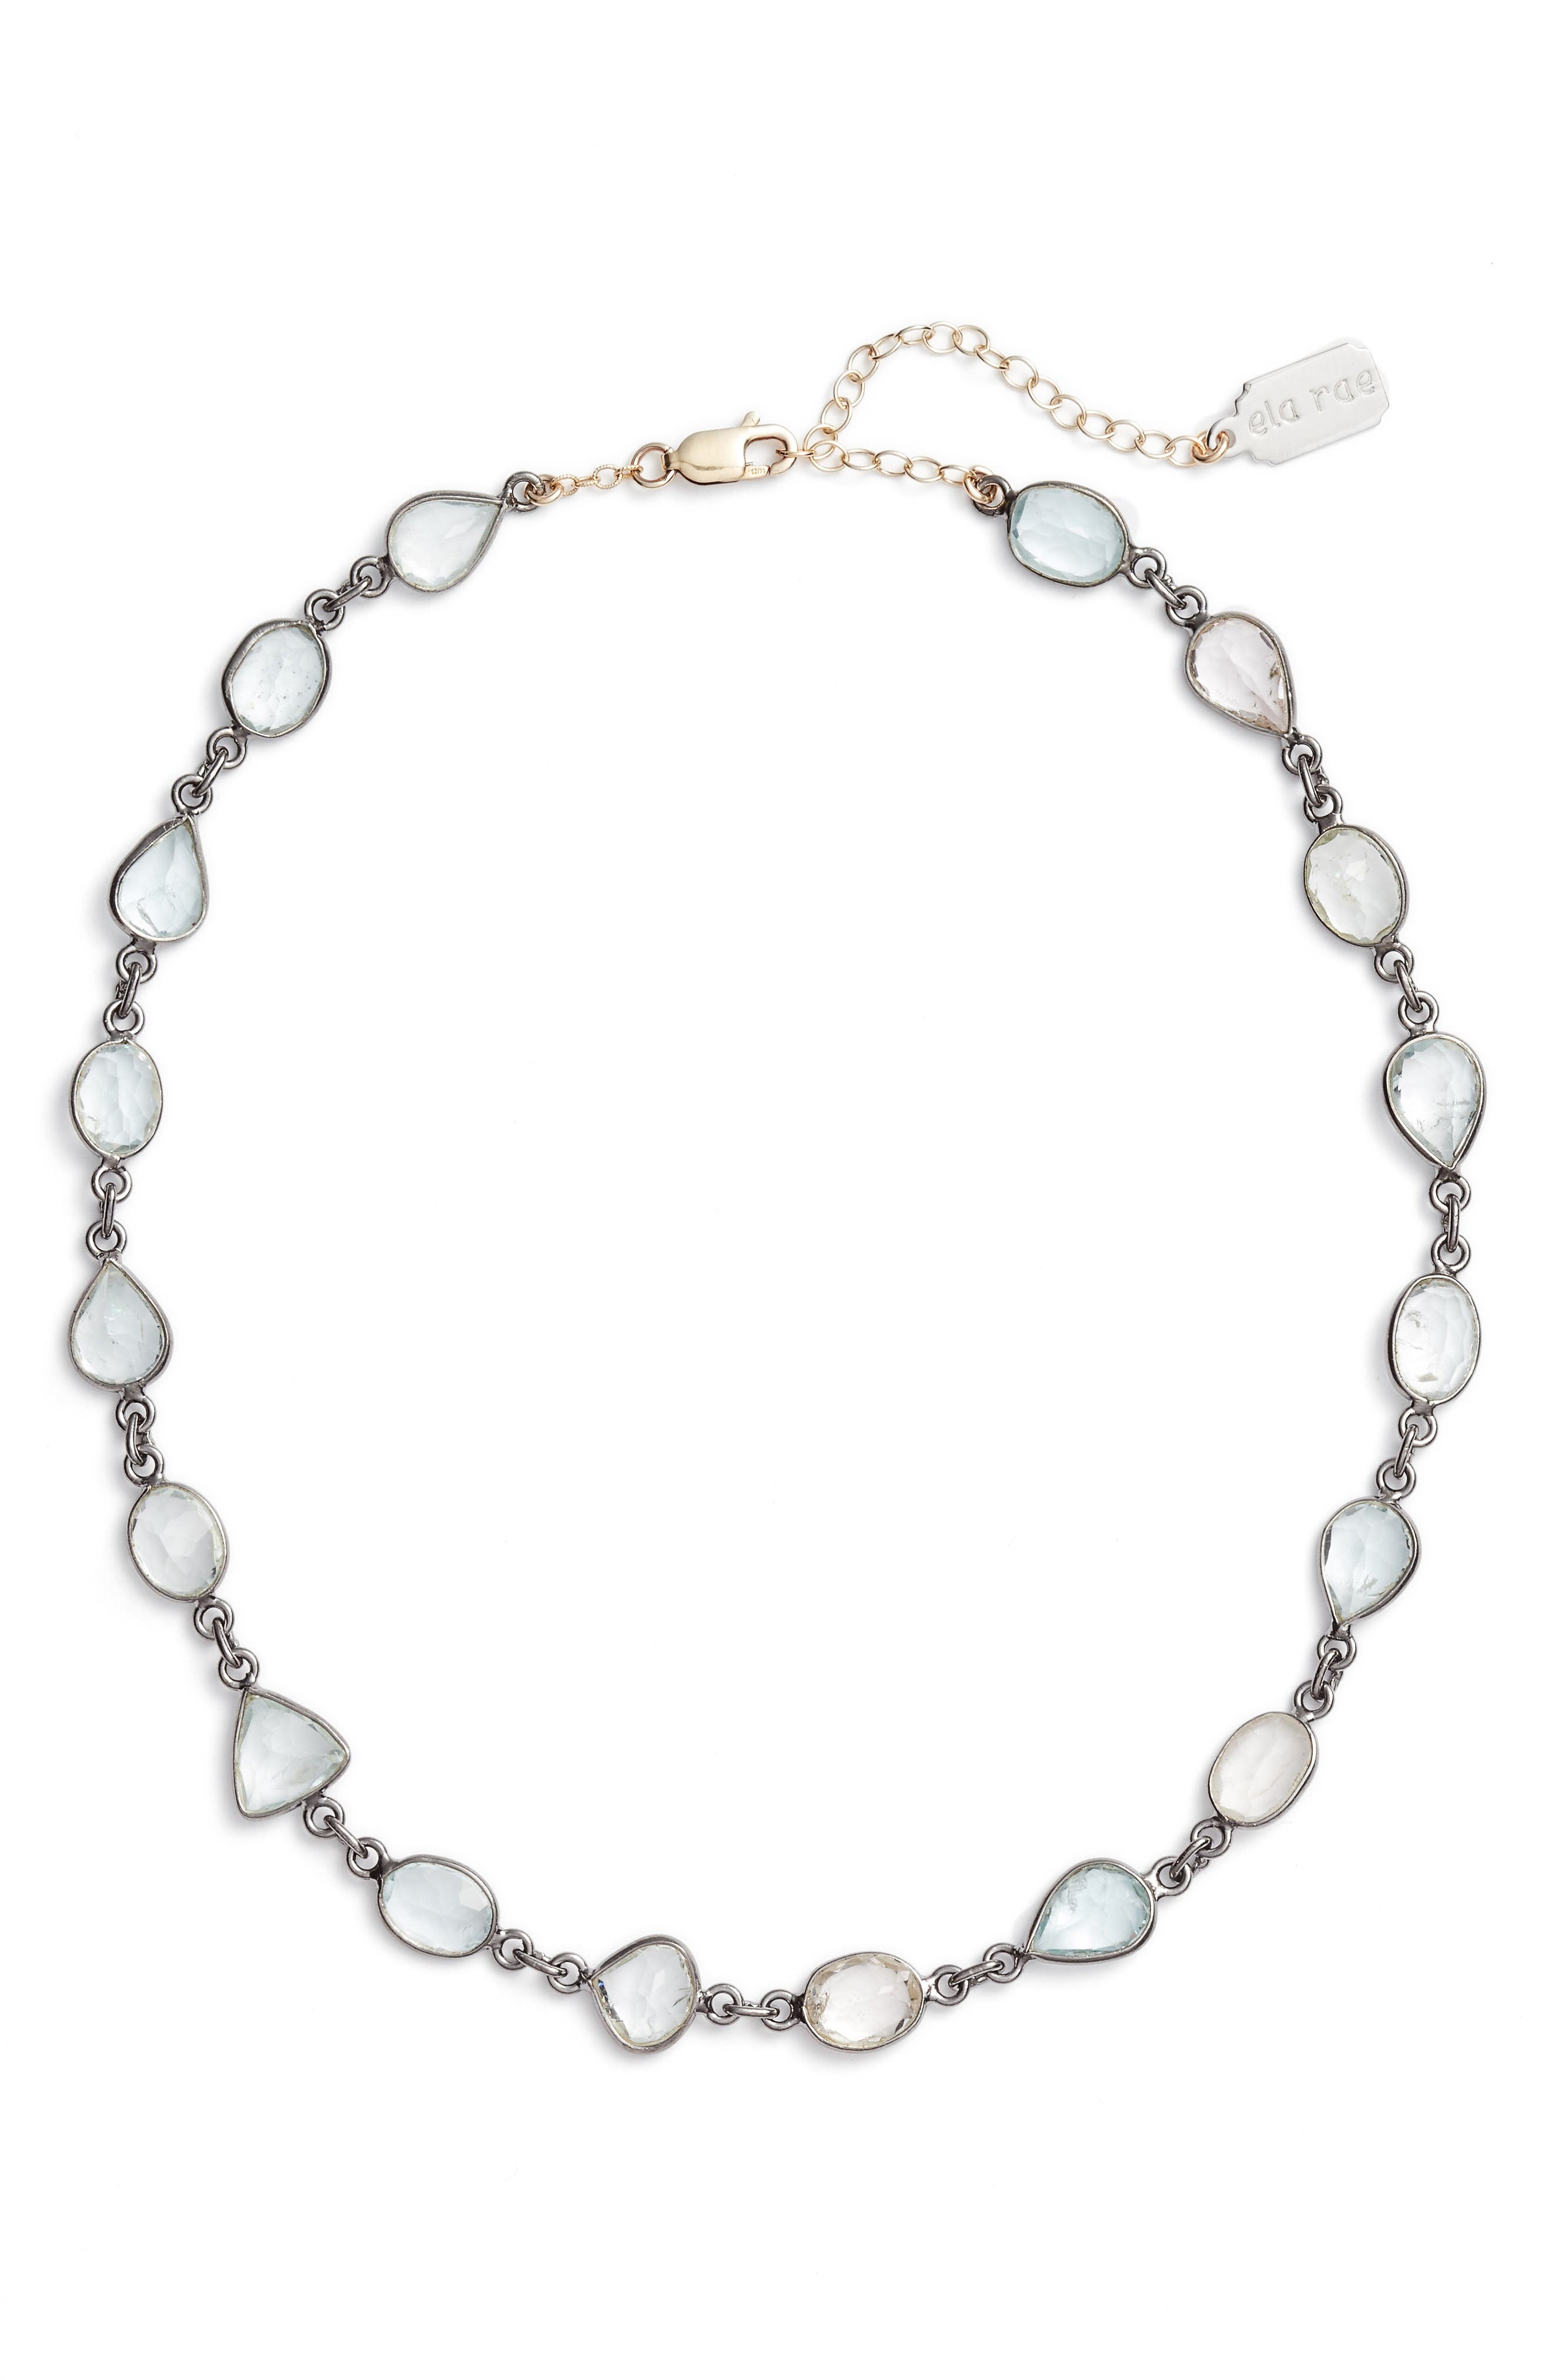 Sadie Collar Necklace,                             Main thumbnail 1, color,                             ROSE CUT AQUAMARINE